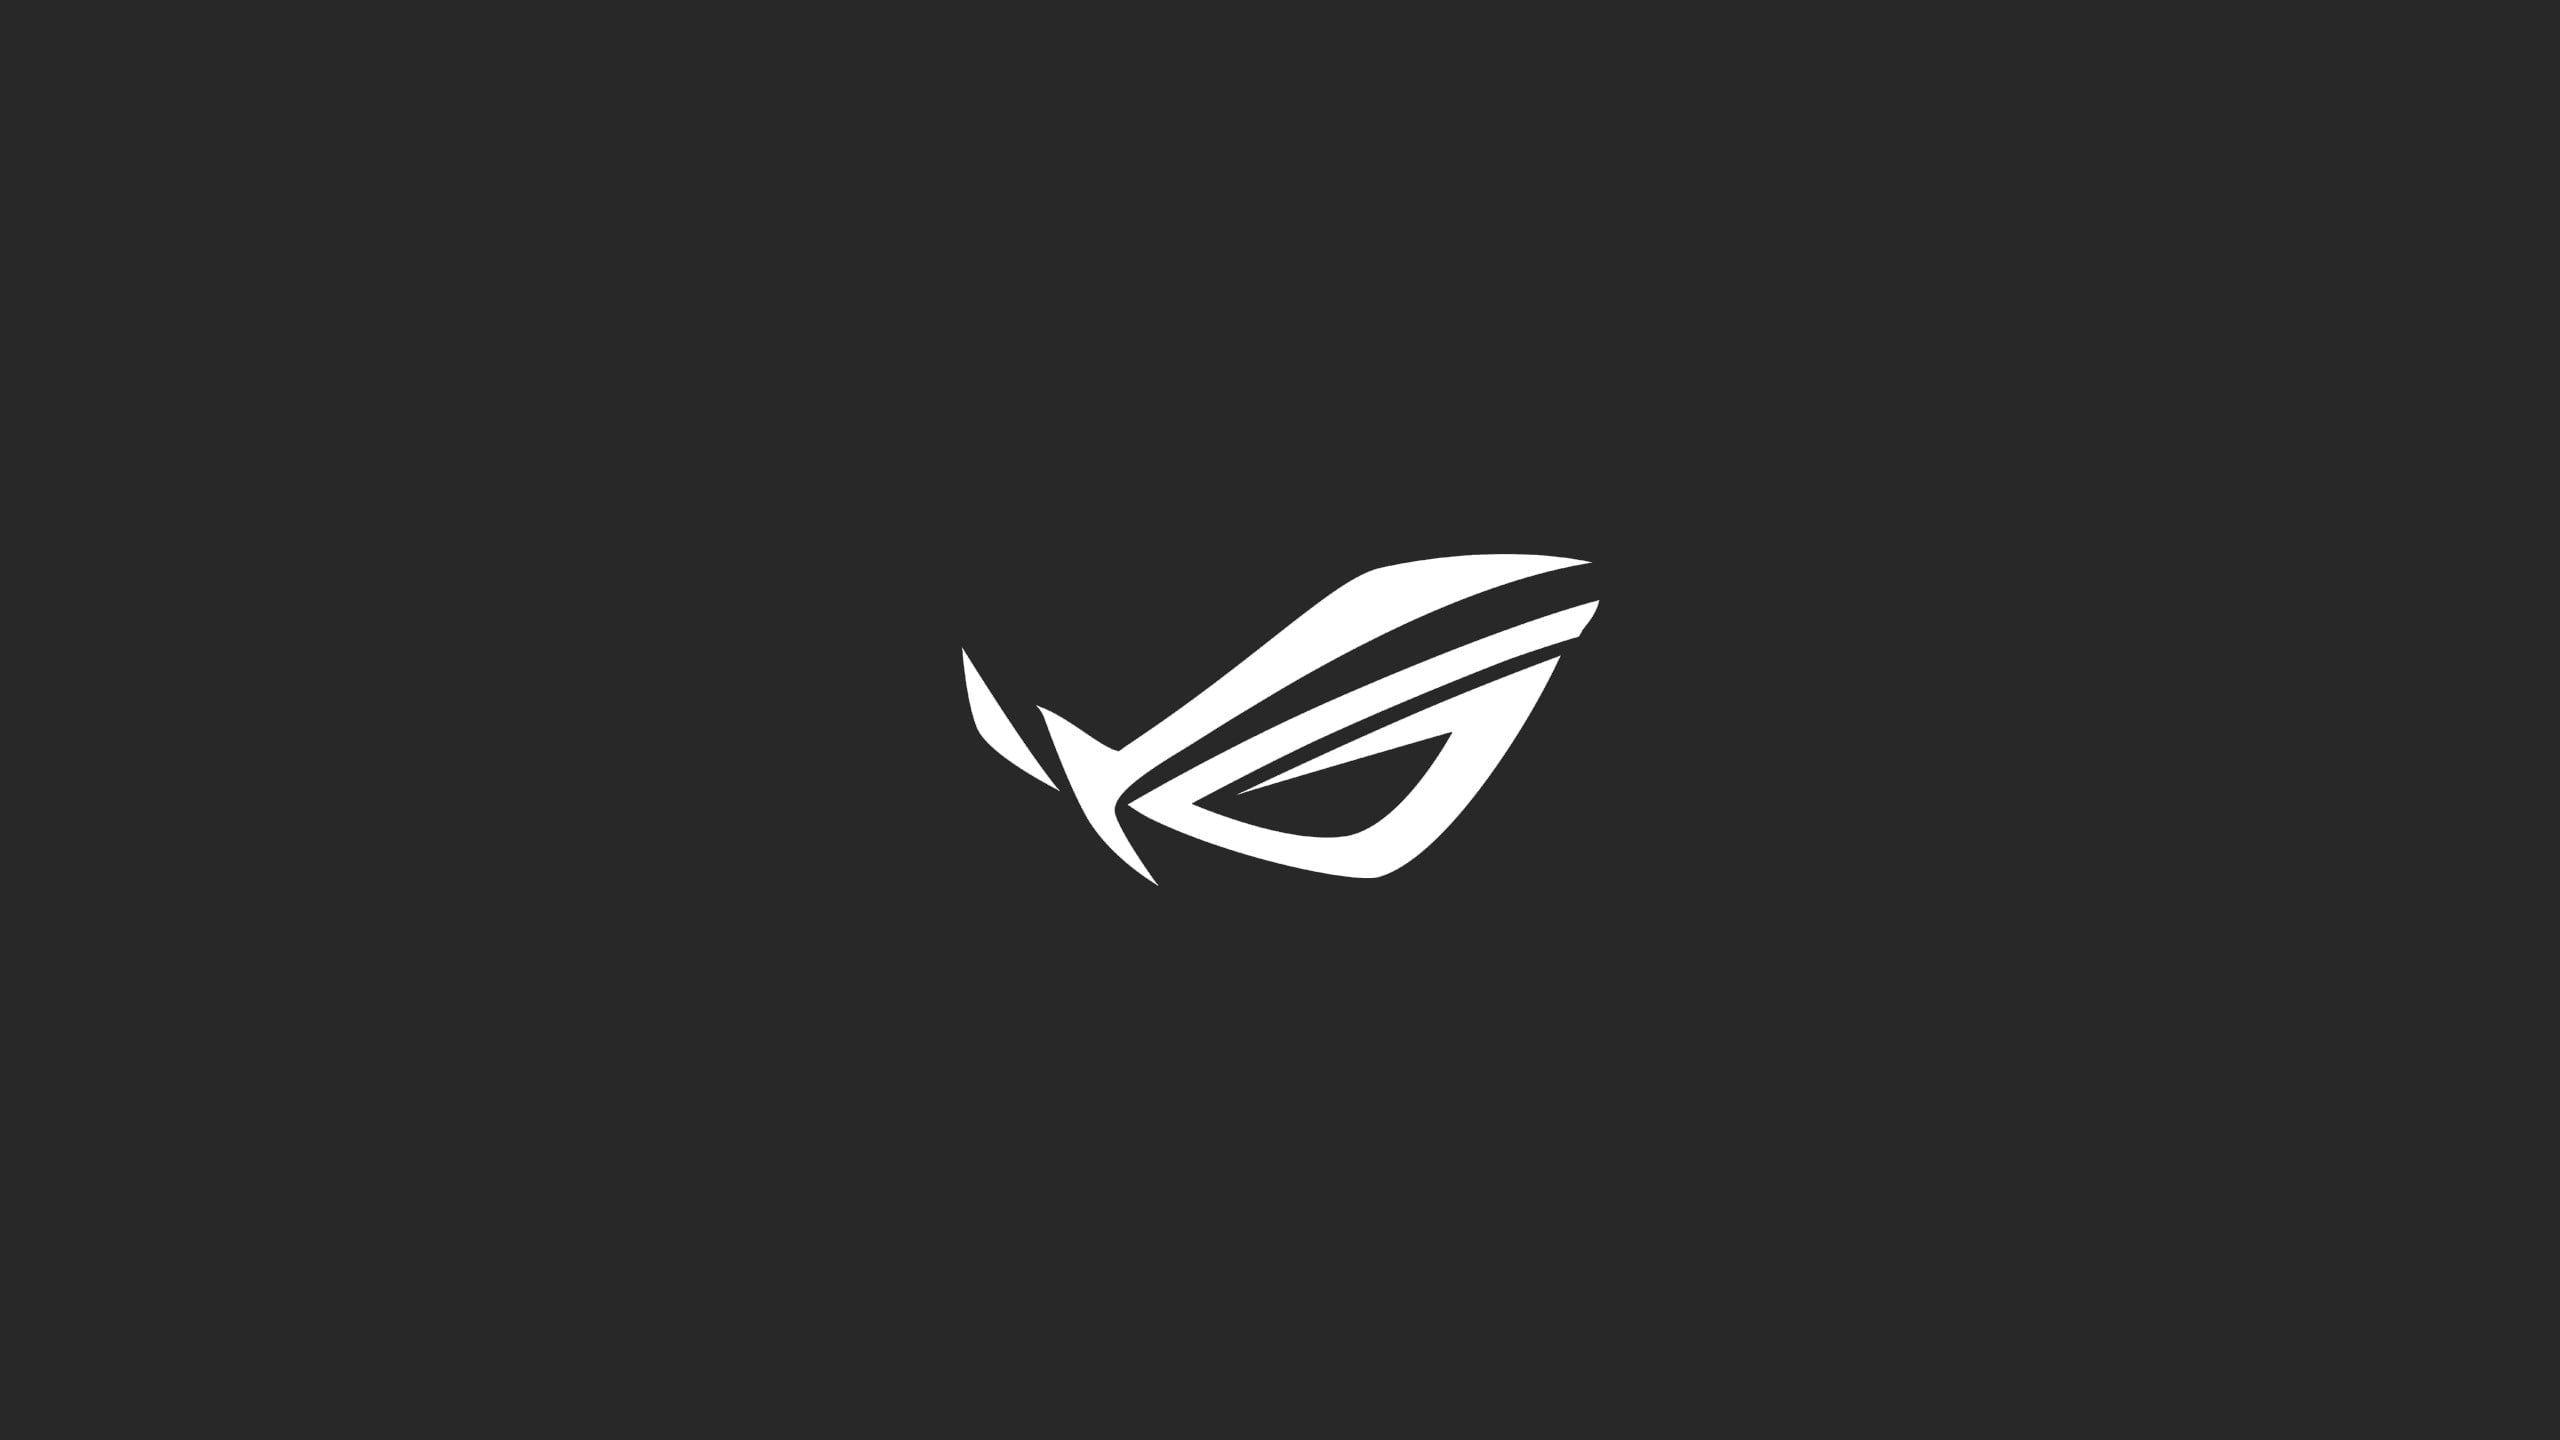 Asus ROG logo Republic of Gamers minimalism studio shot black 2560x1440